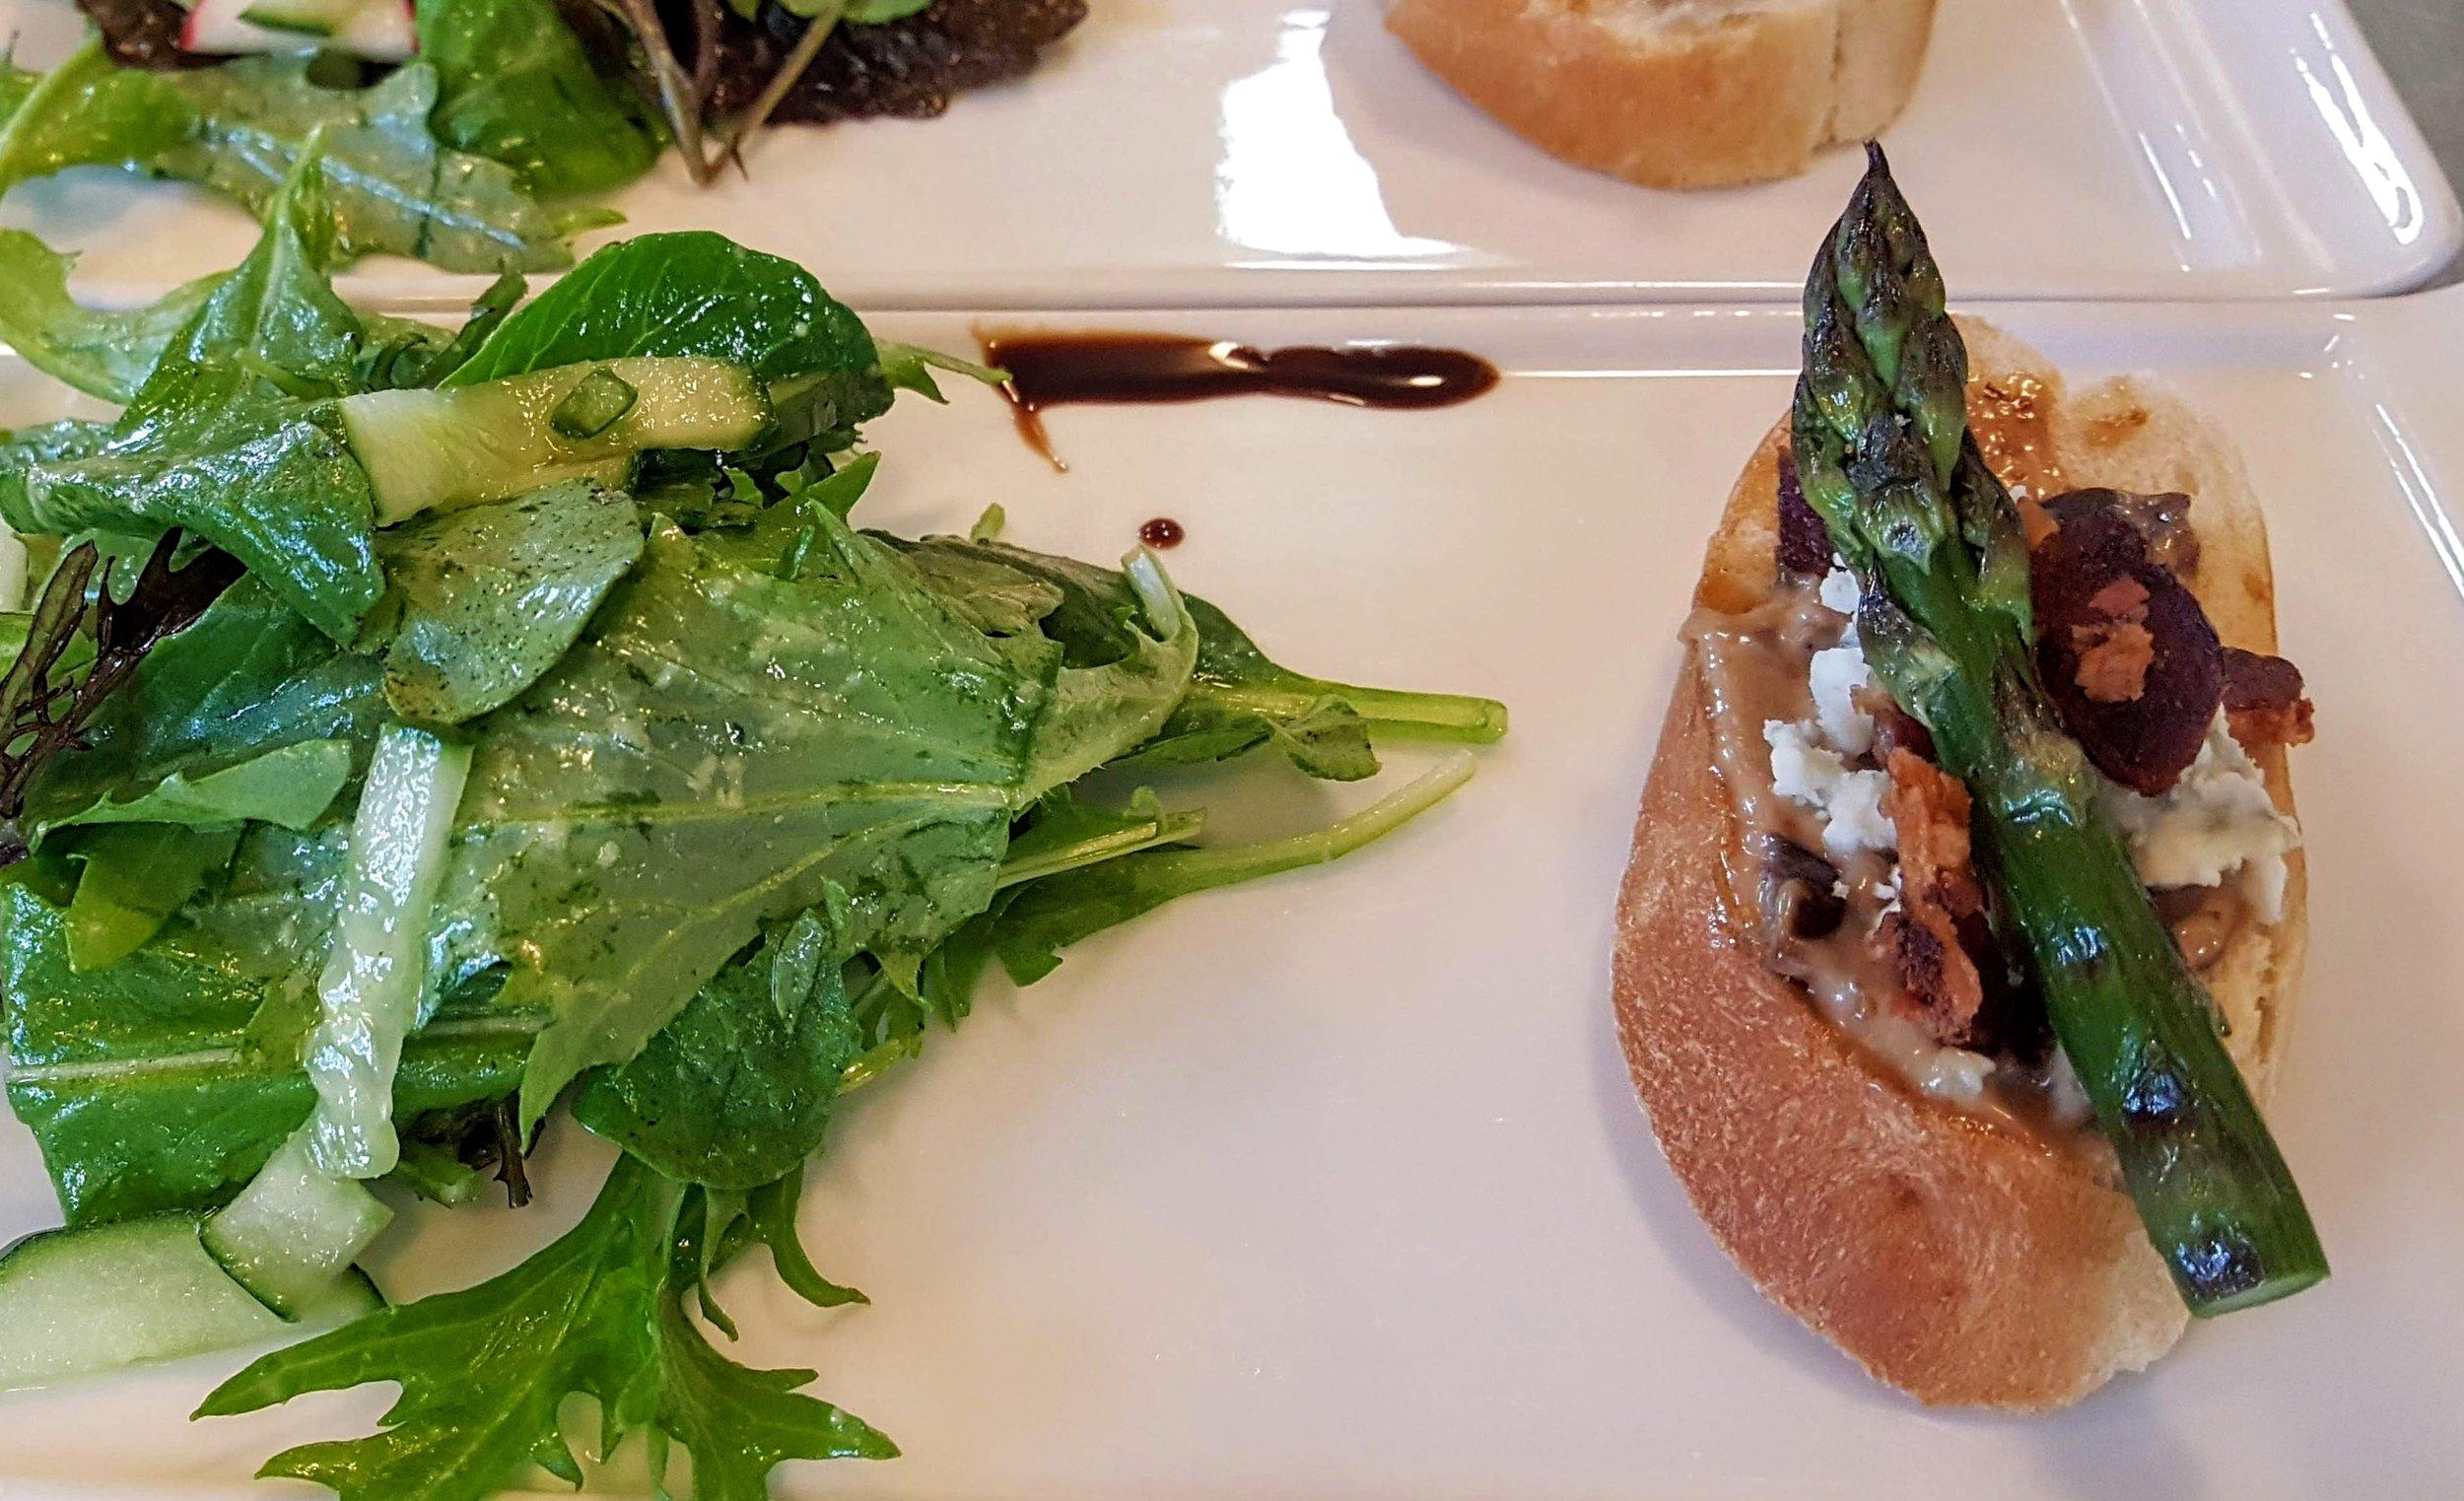 Smokey Blue & Bacon Bruschetta  Grilled asparagus, local mixed greens, cucumber & lemon vinaigrette